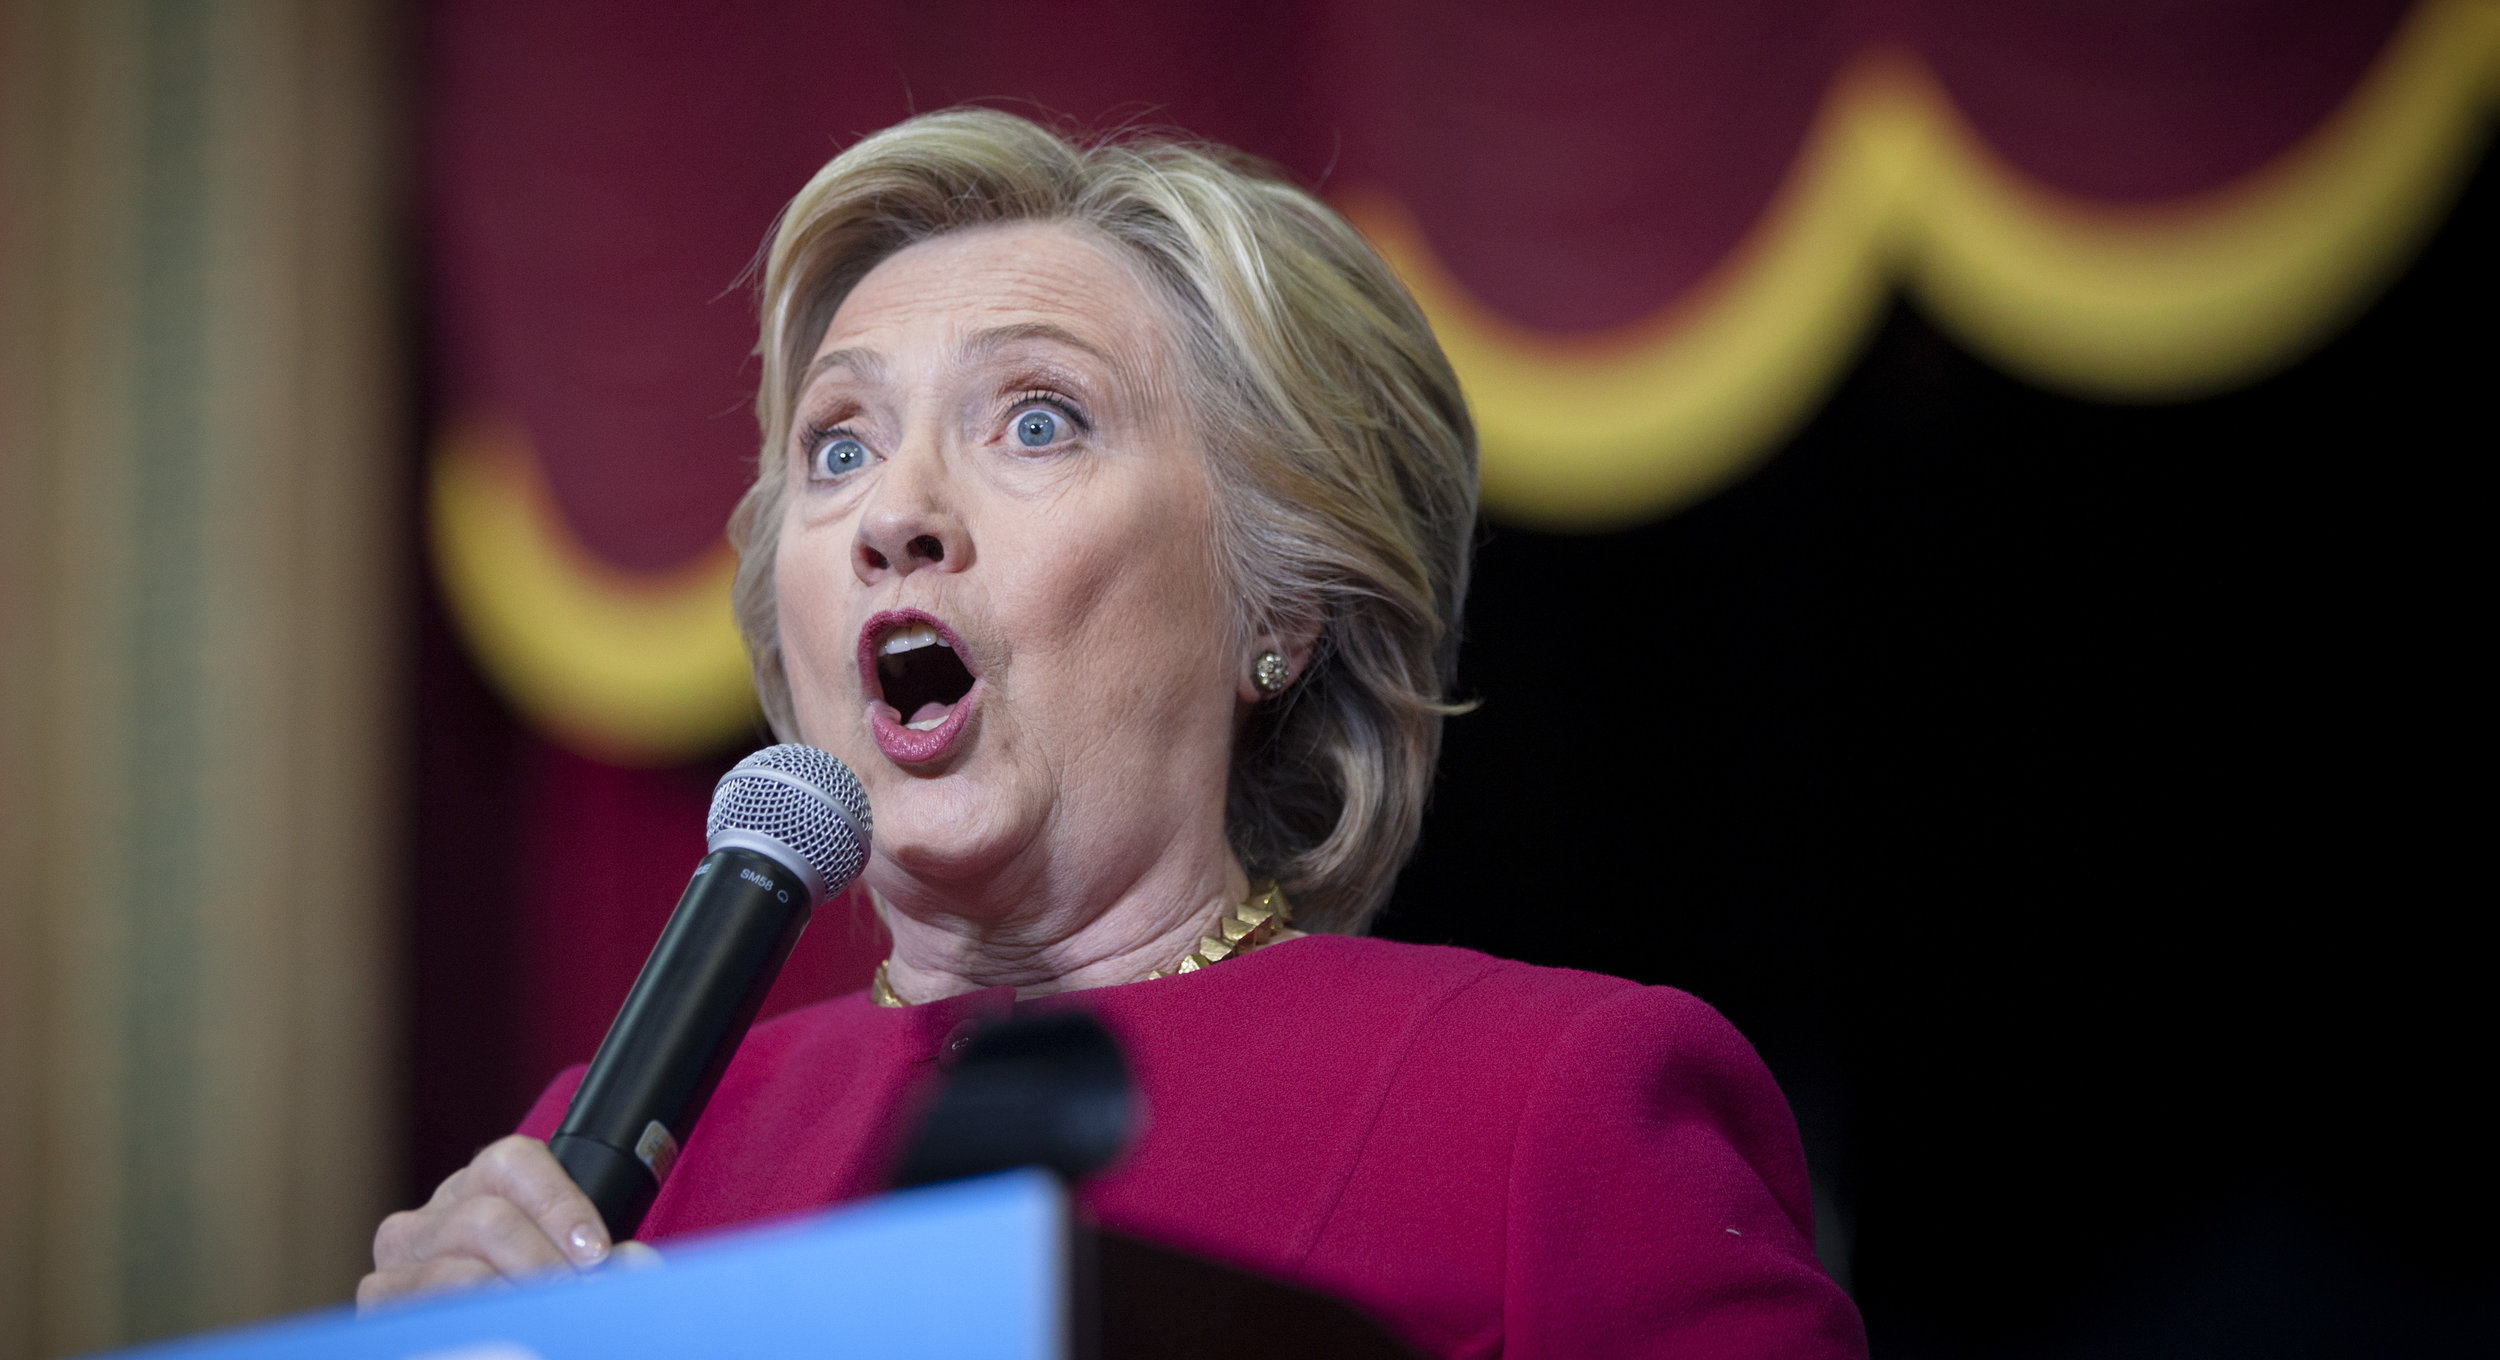 10042016_BJM_Hillary_Clinton_Campaigns_in_Harrisburg_Pennsylvania_12.jpg